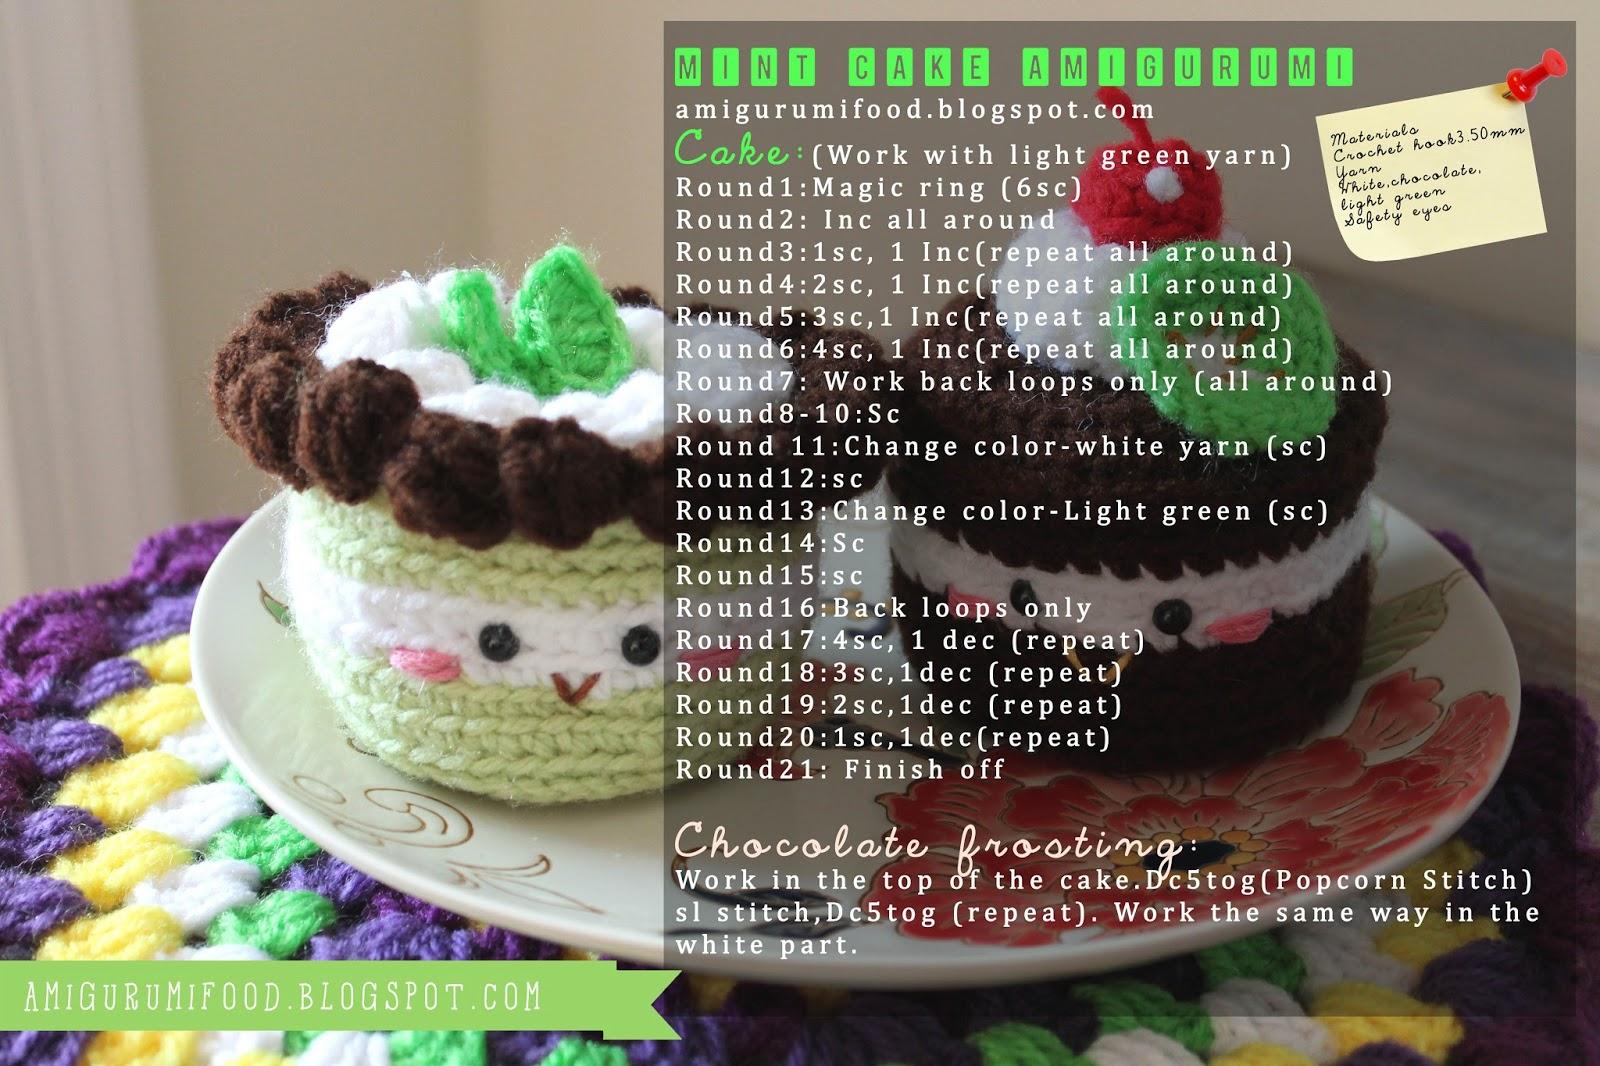 Amigurumi Patterns Free Food : Amigurumi Food: Mint cake Amigurumi {Free Pattern}